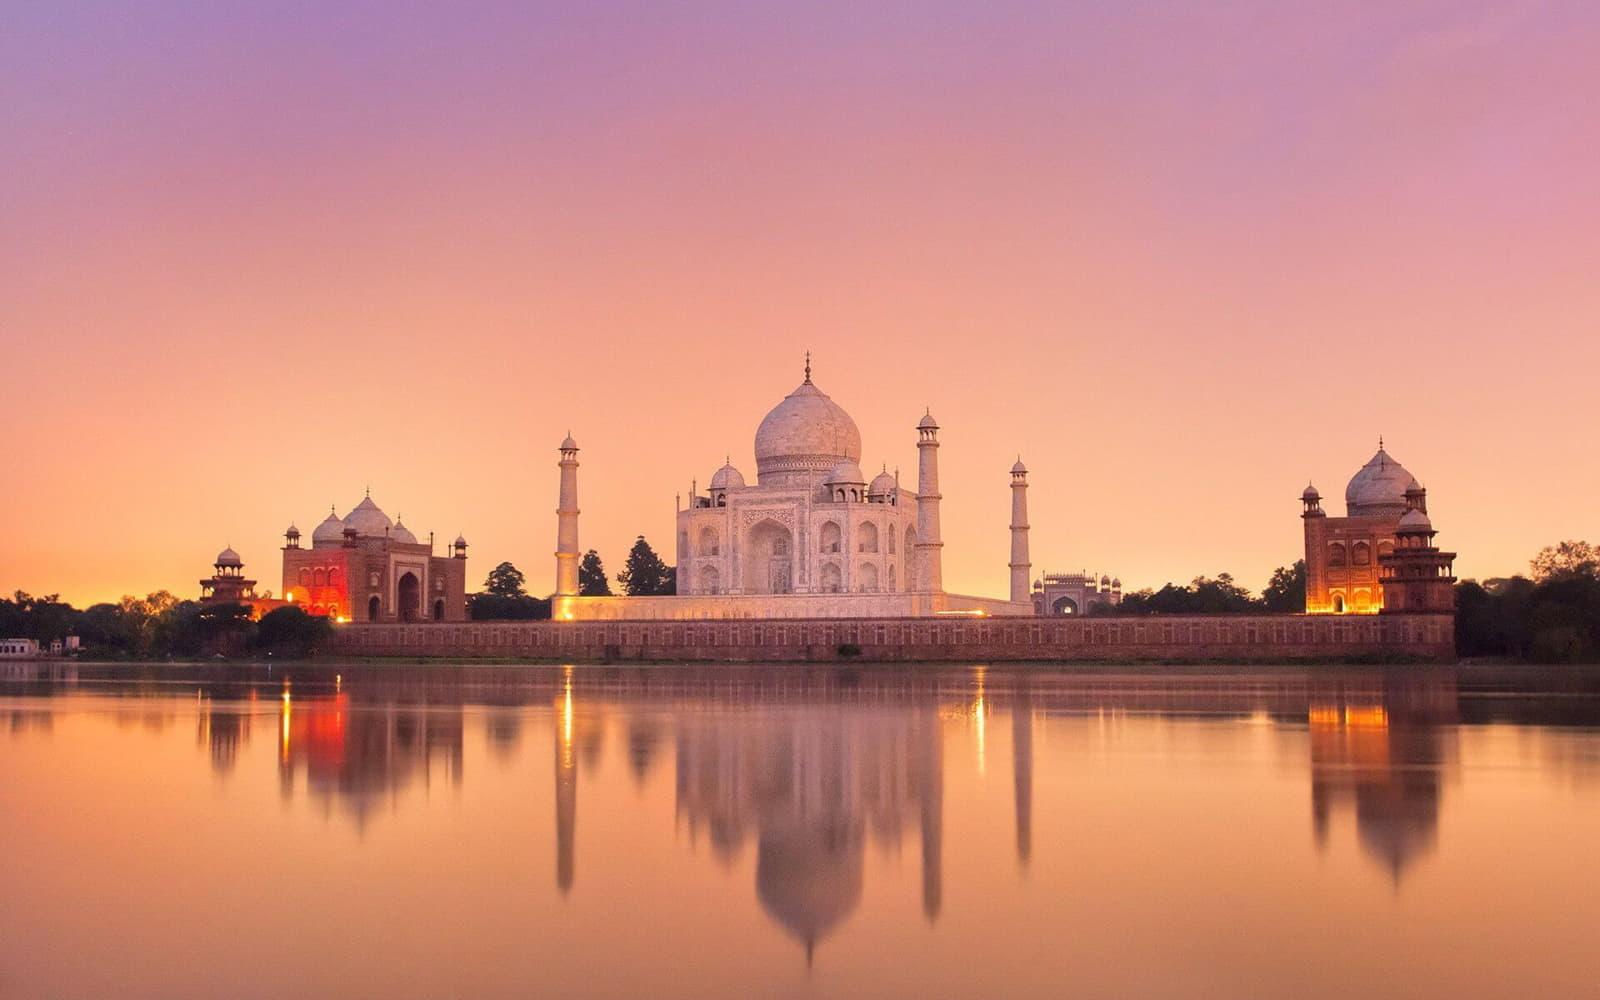 India Προορισμοί για ζευγάρια Ταζ Μαχάλ loveyourholidays